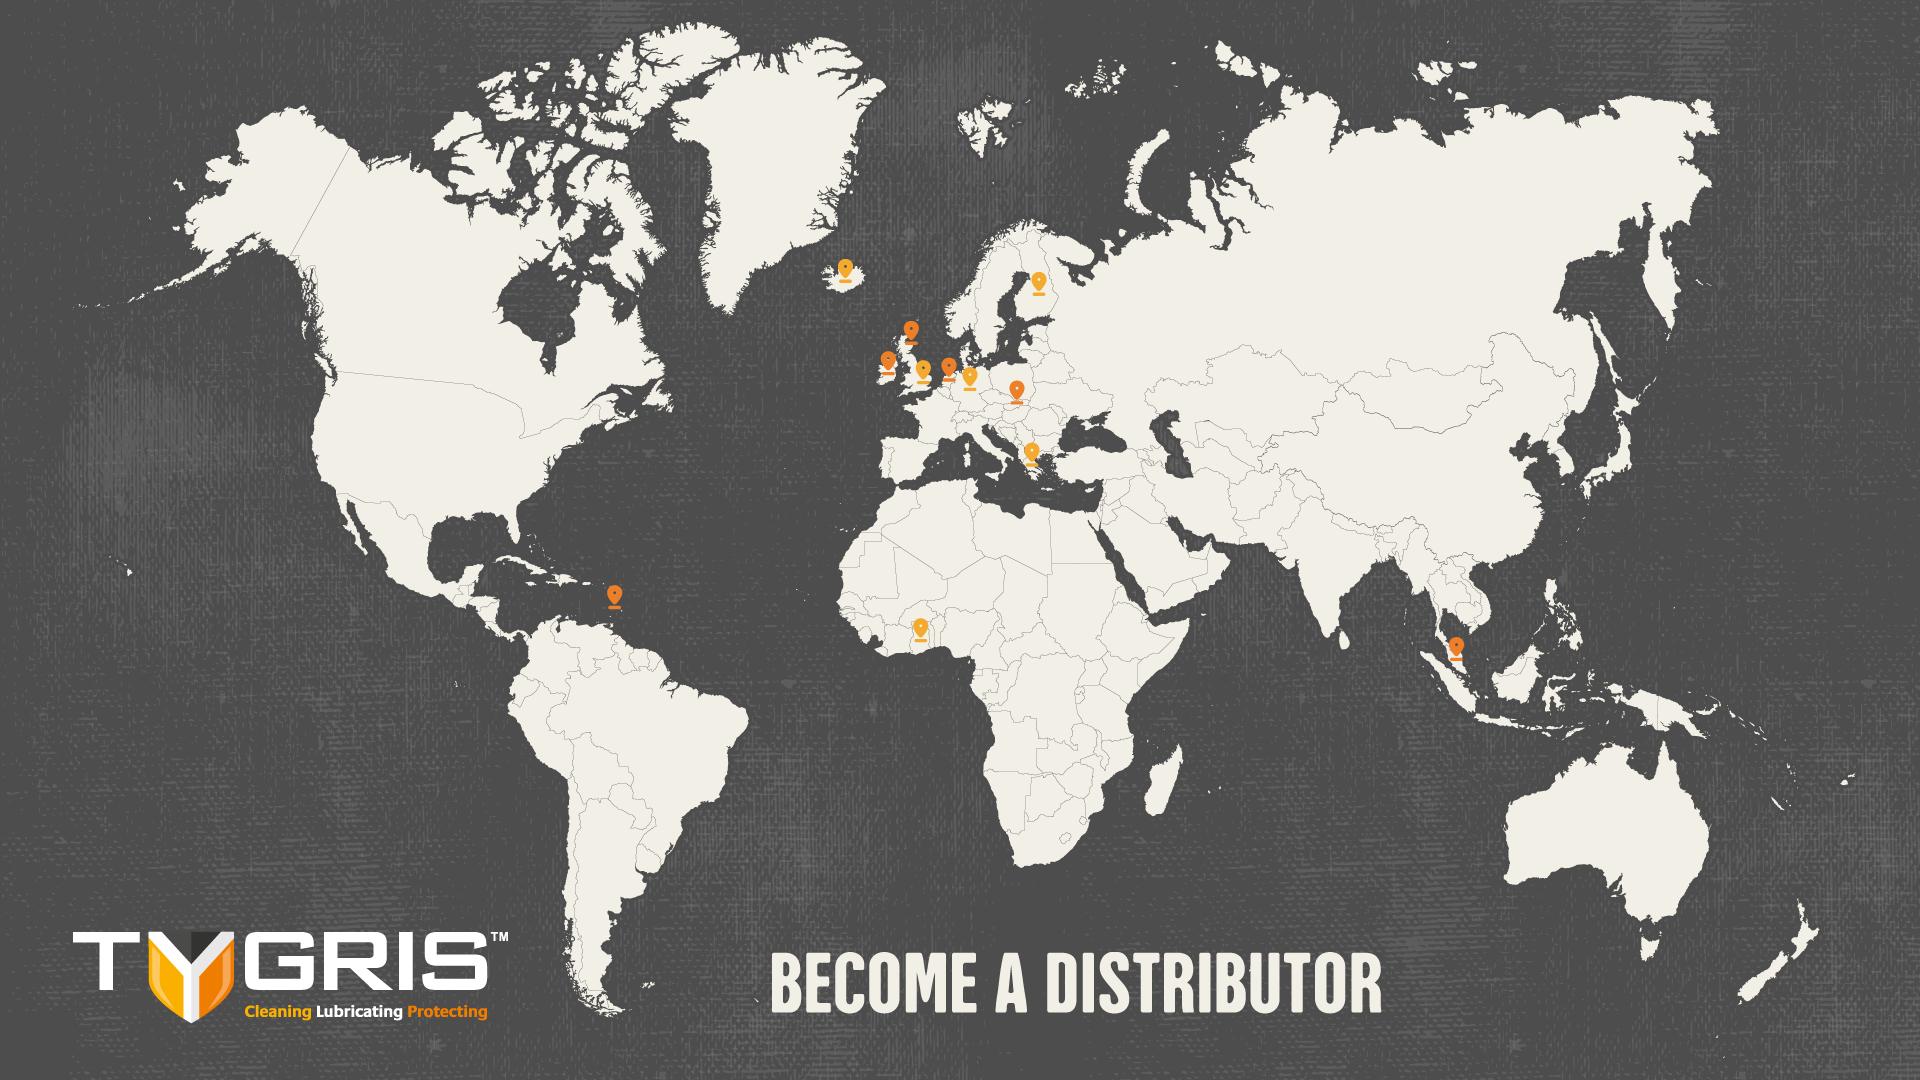 tygris-world-map-logo.png